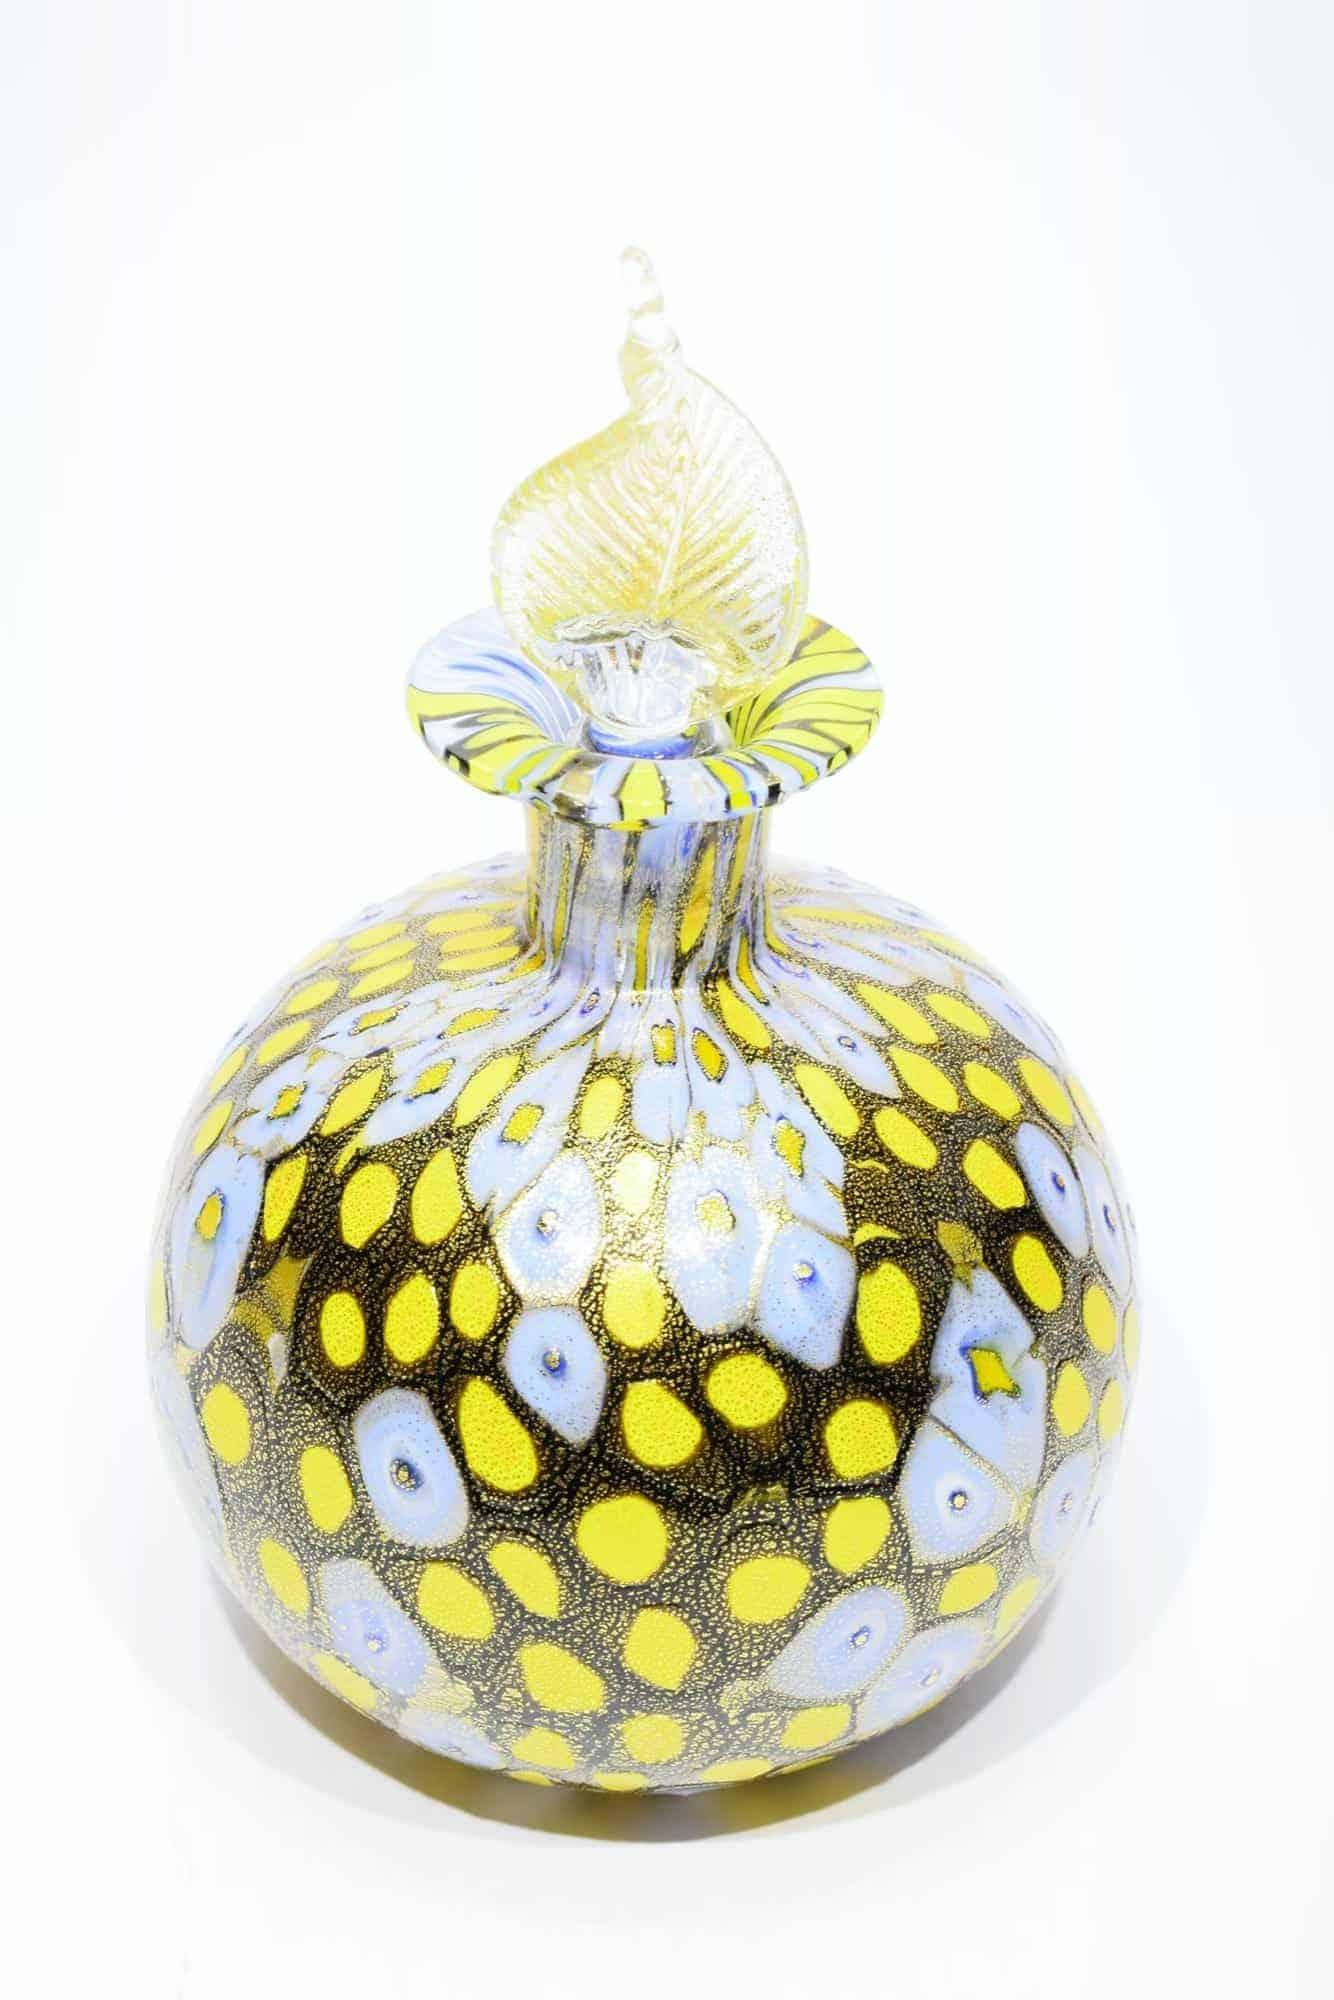 Бутылка Муррина из муранского стекла - (Art. 34514)